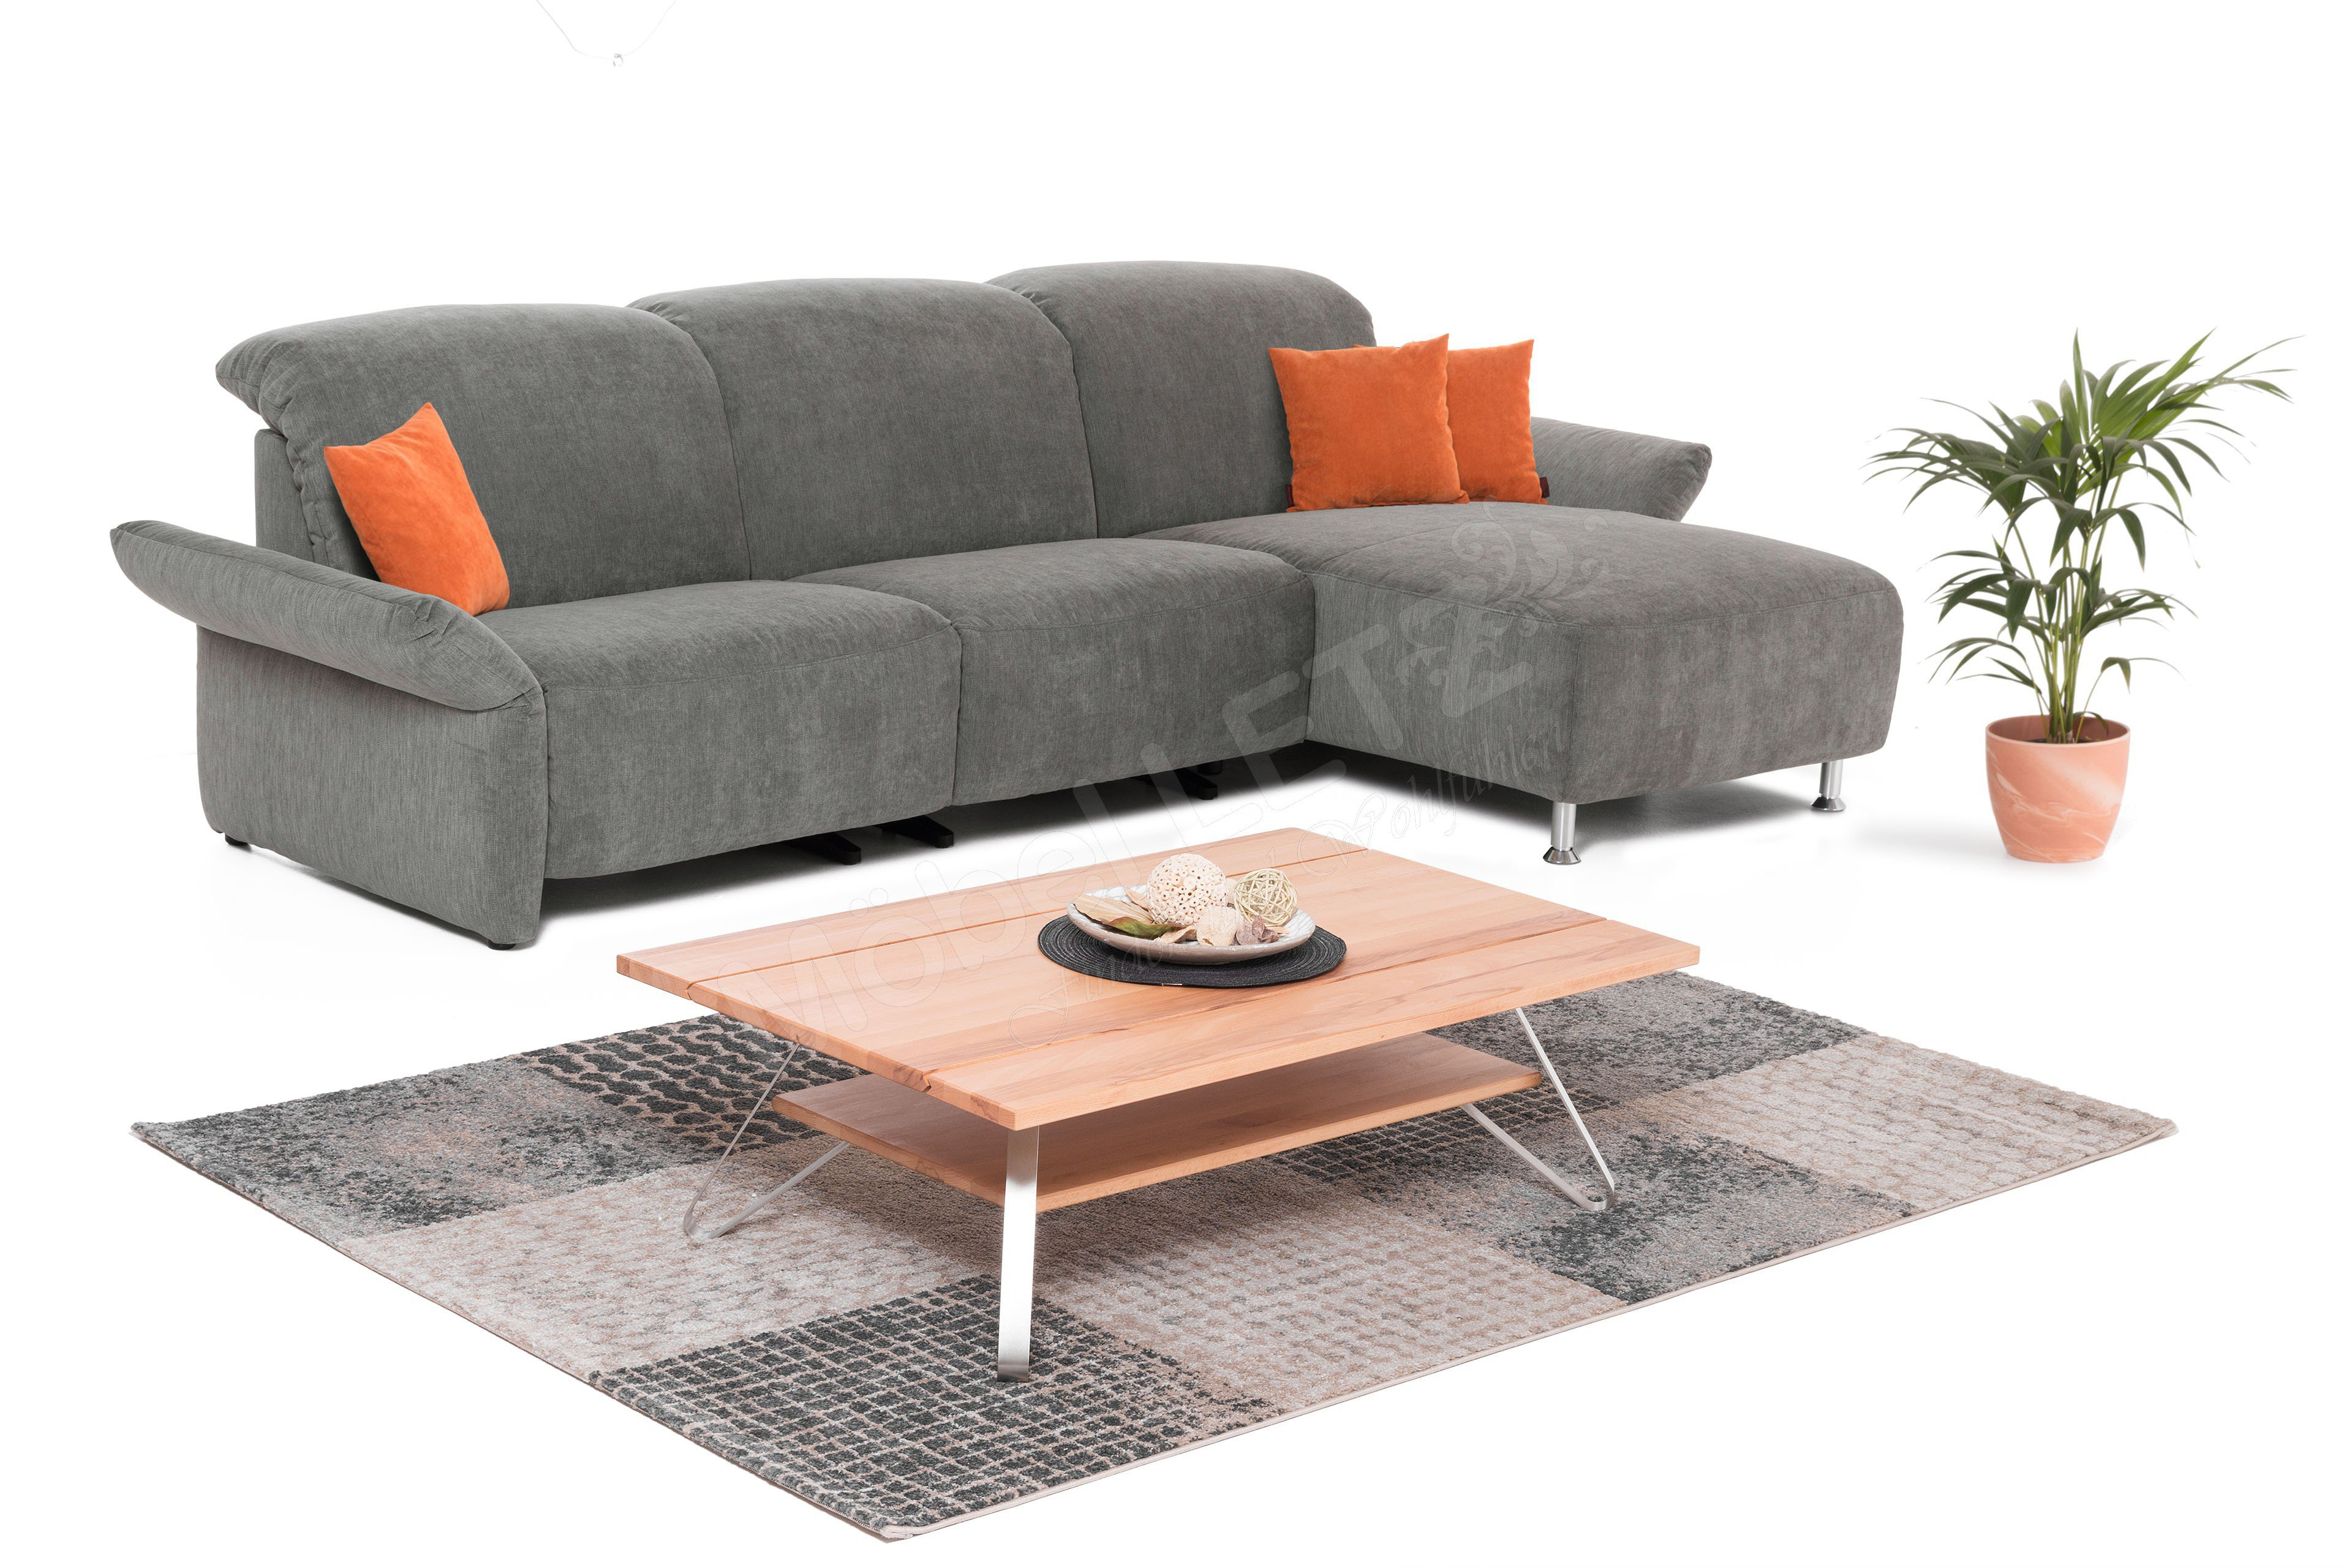 k w polsterm bel cindy ecksofa grau m bel letz ihr. Black Bedroom Furniture Sets. Home Design Ideas